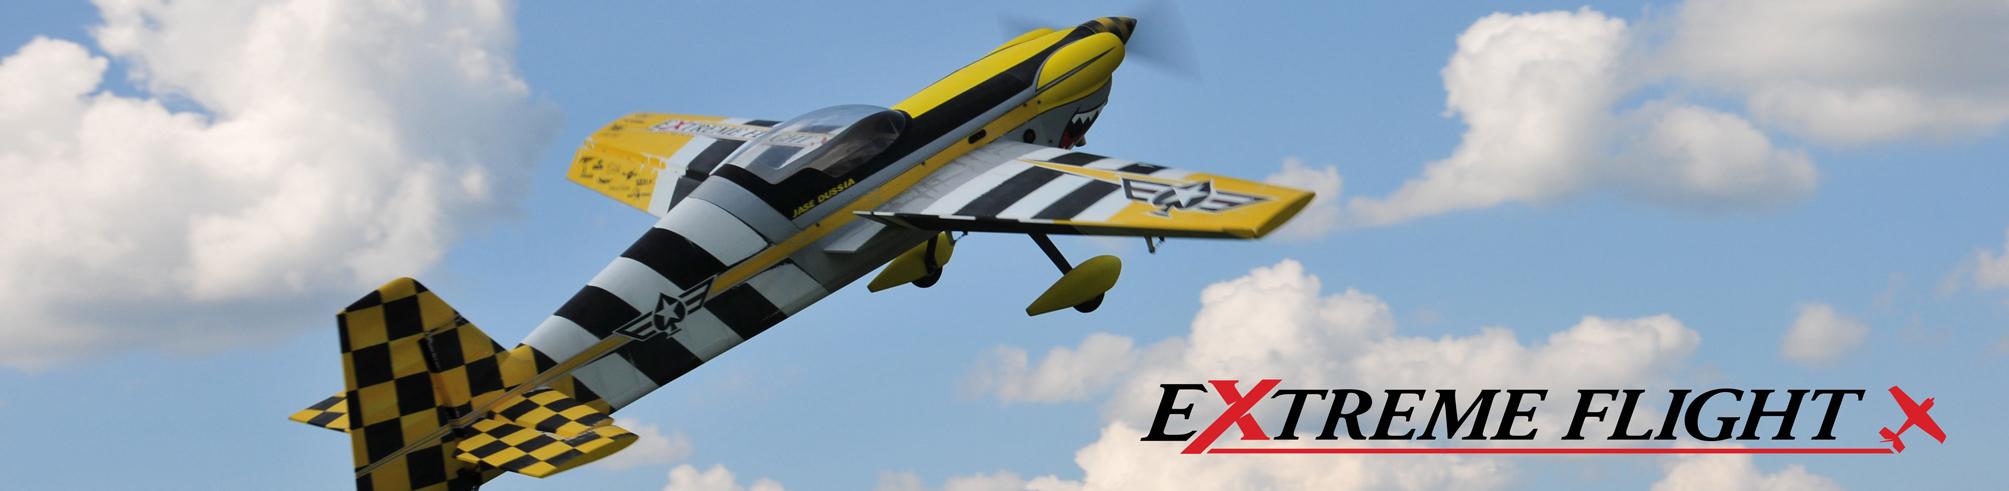 Extreme Flight